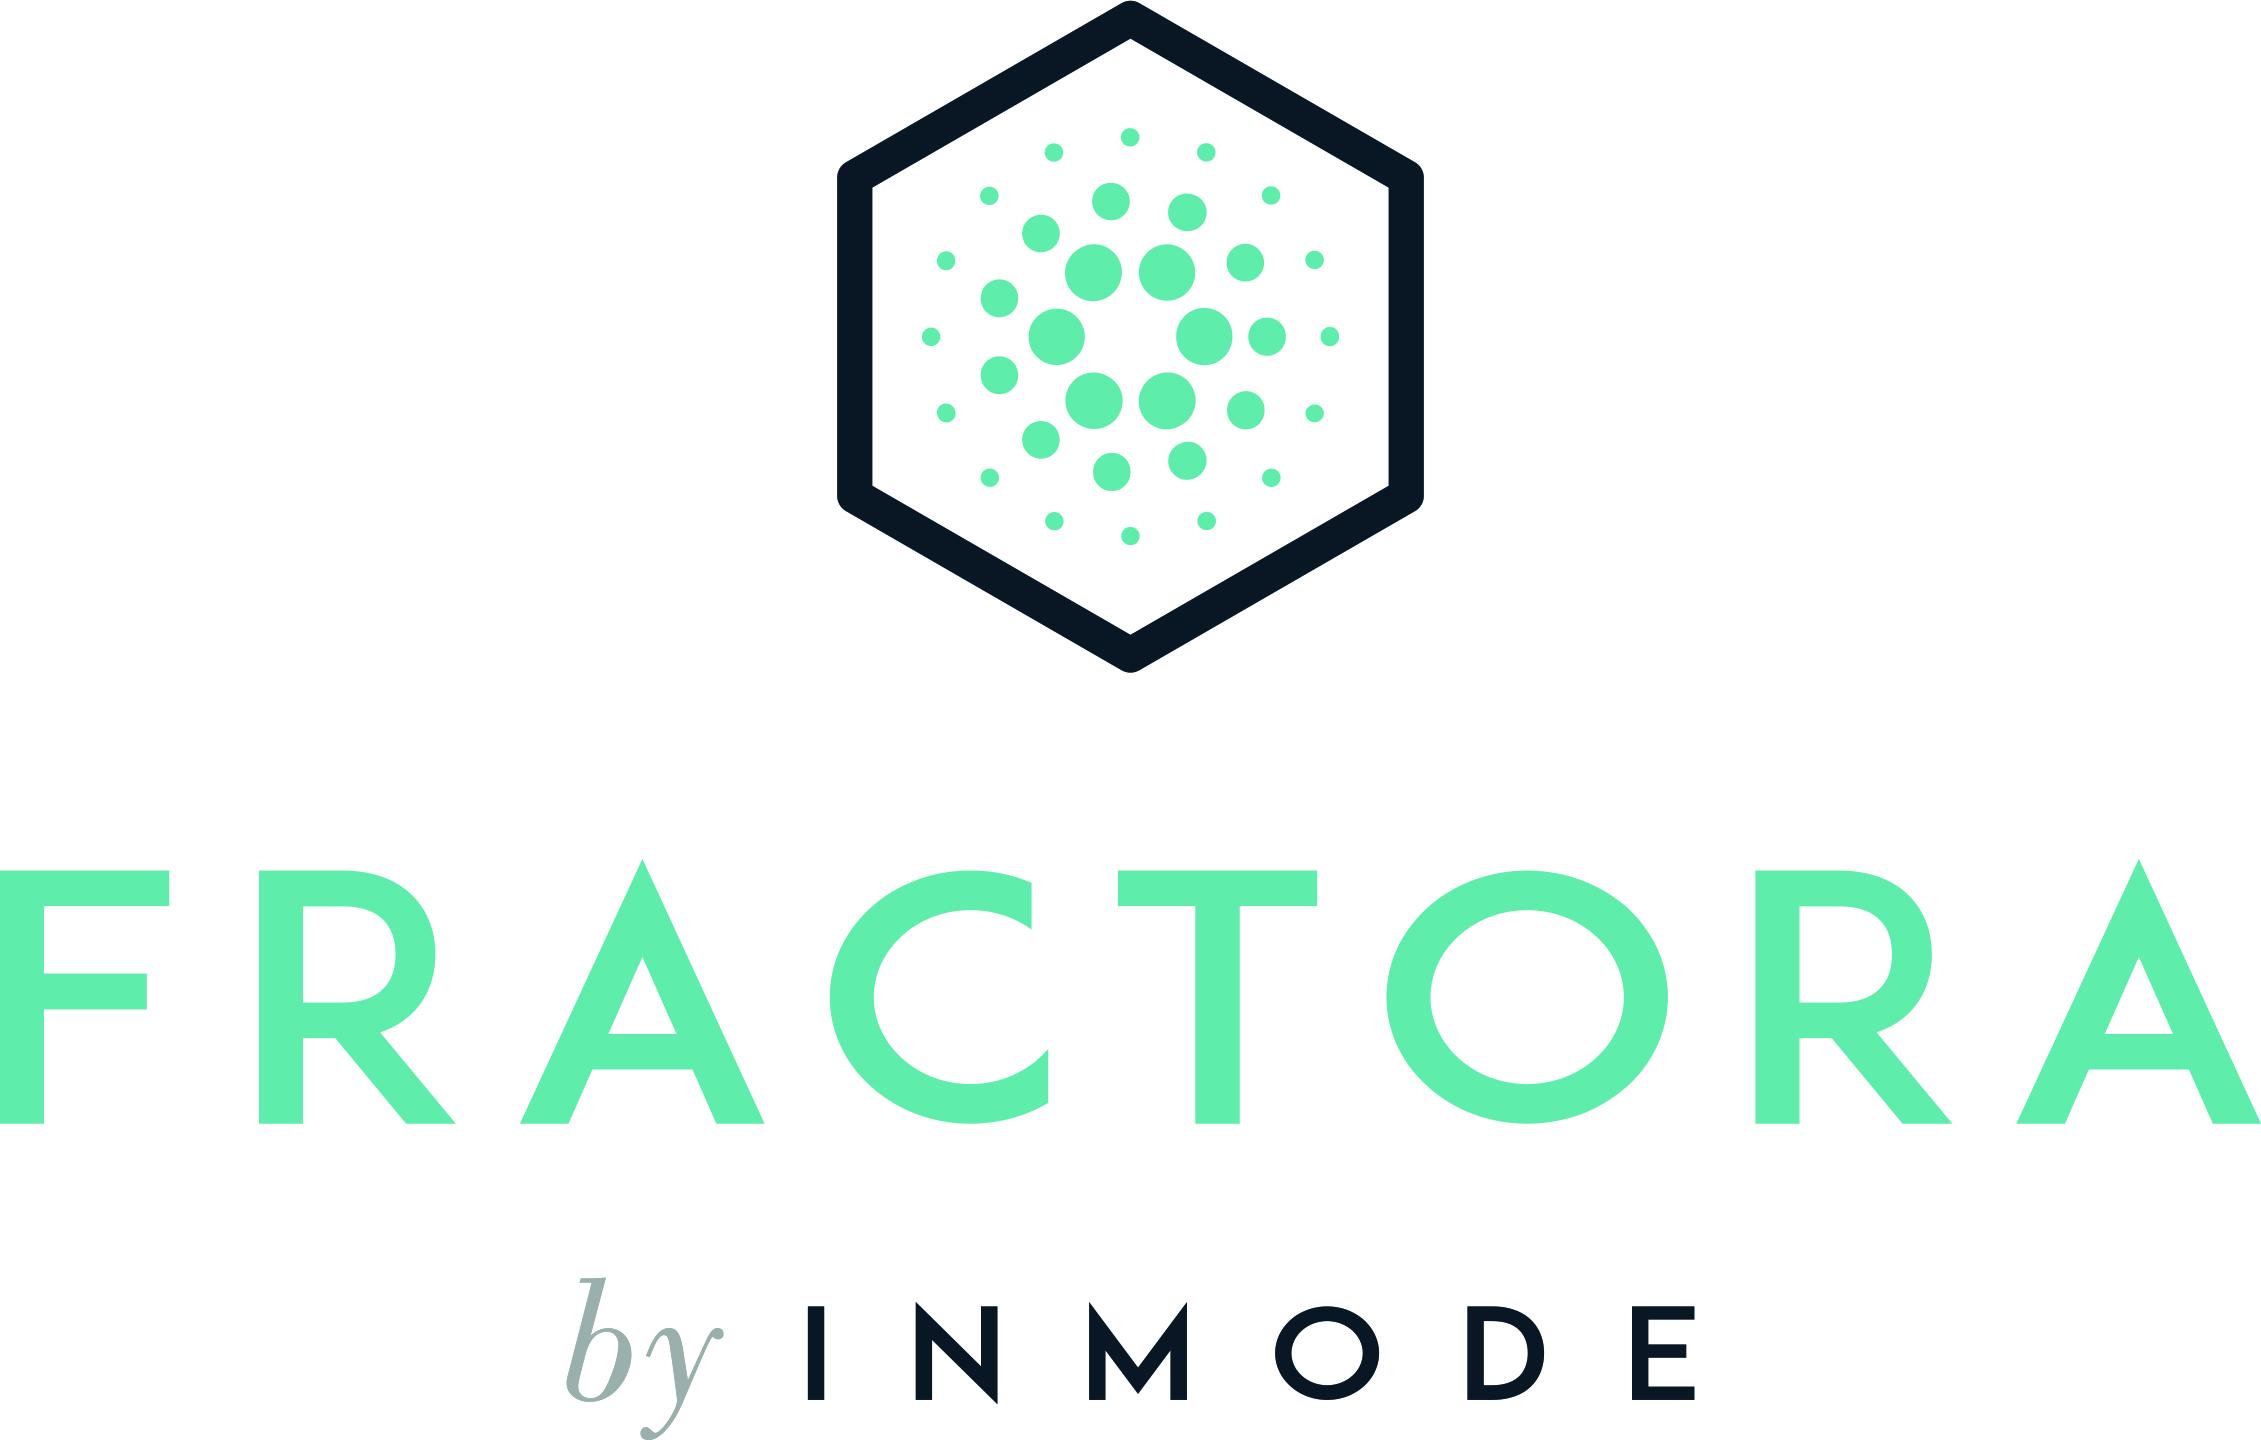 CA014-InMode-Fractora-Logo-CMYK-HR.jpg